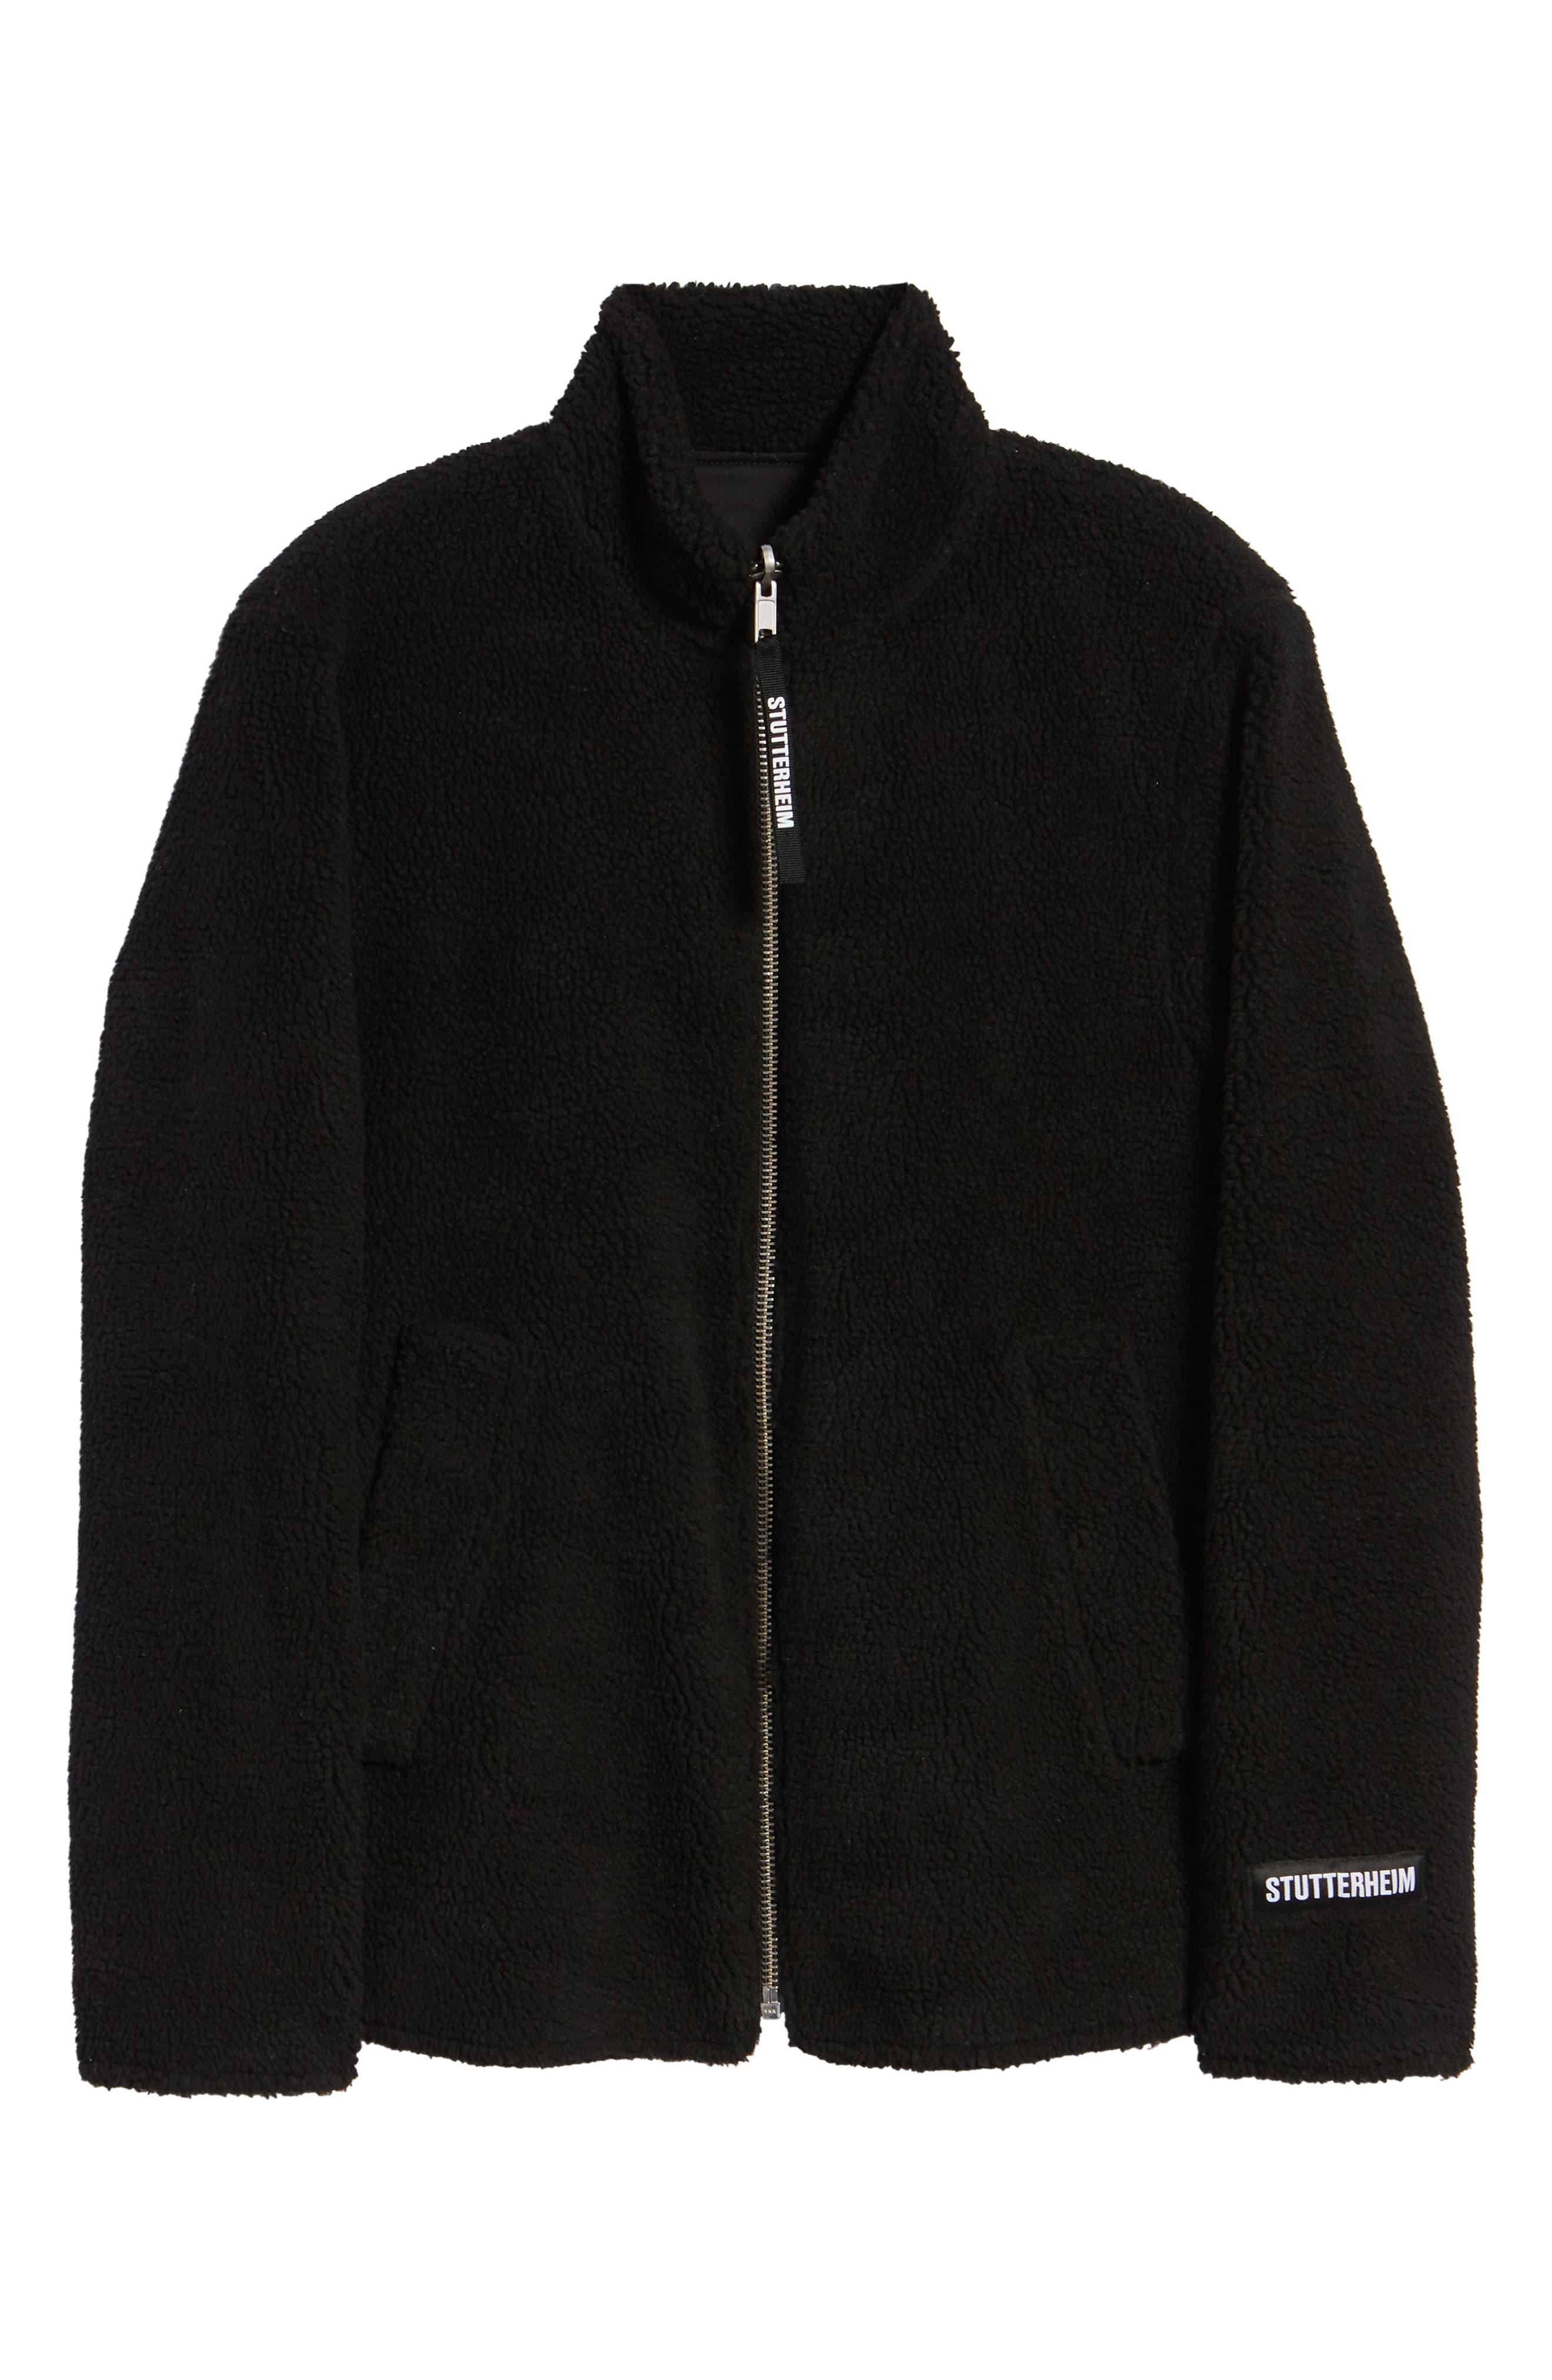 Varby Reversible Fleece Jacket,                             Alternate thumbnail 8, color,                             BLACK